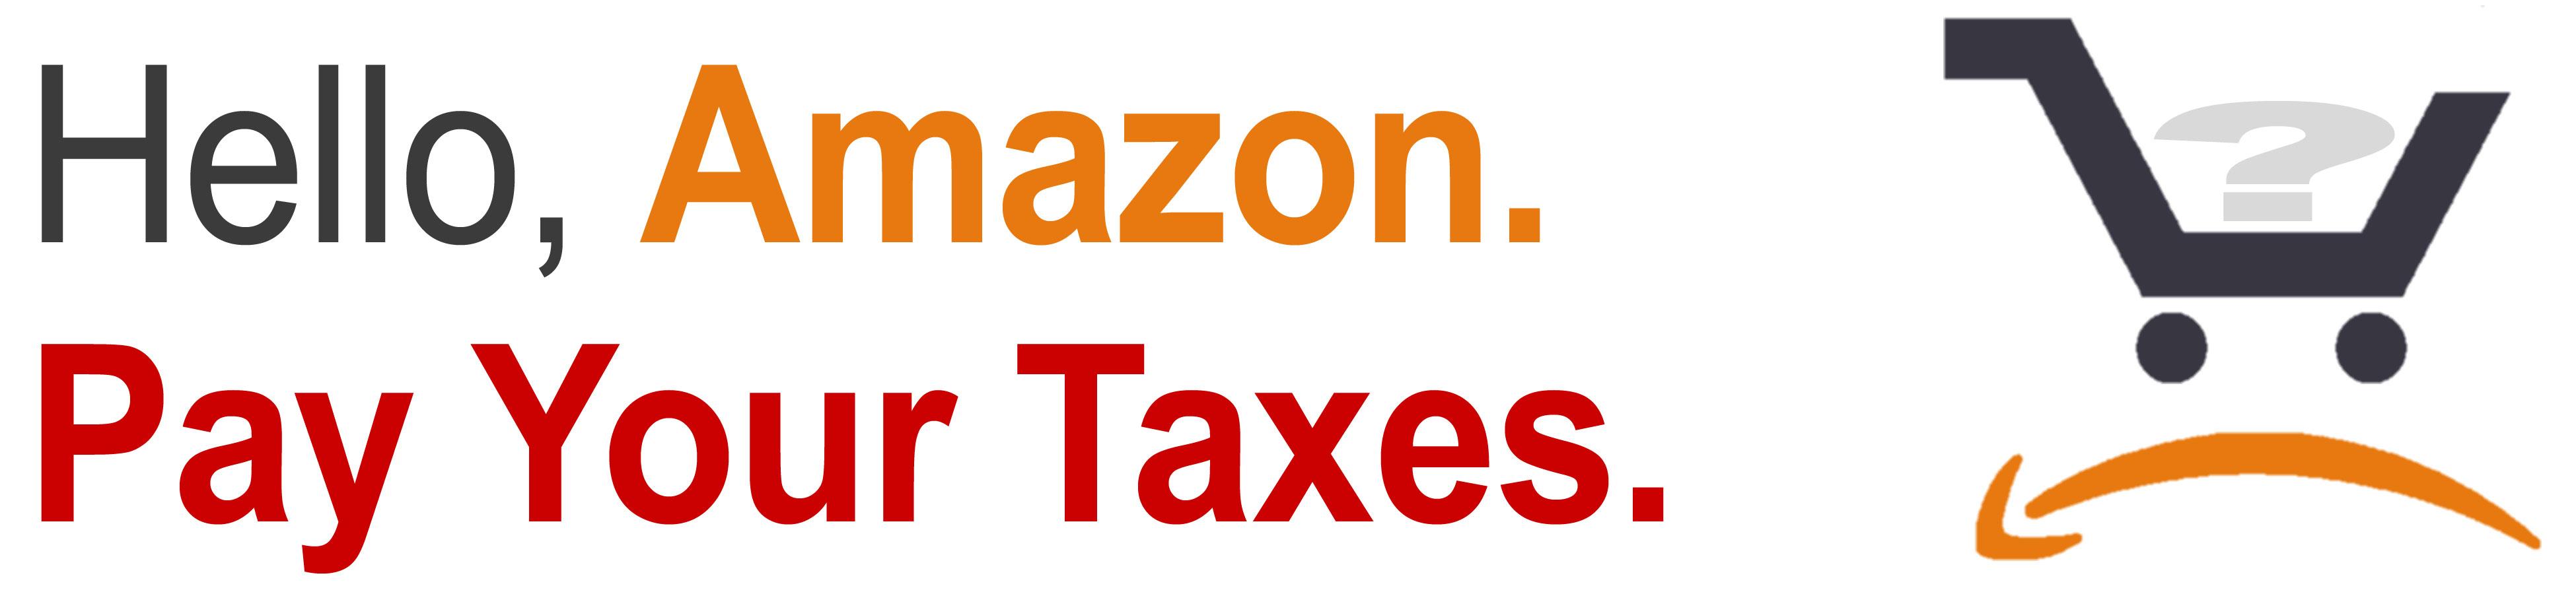 amazon-taxes-banner-2